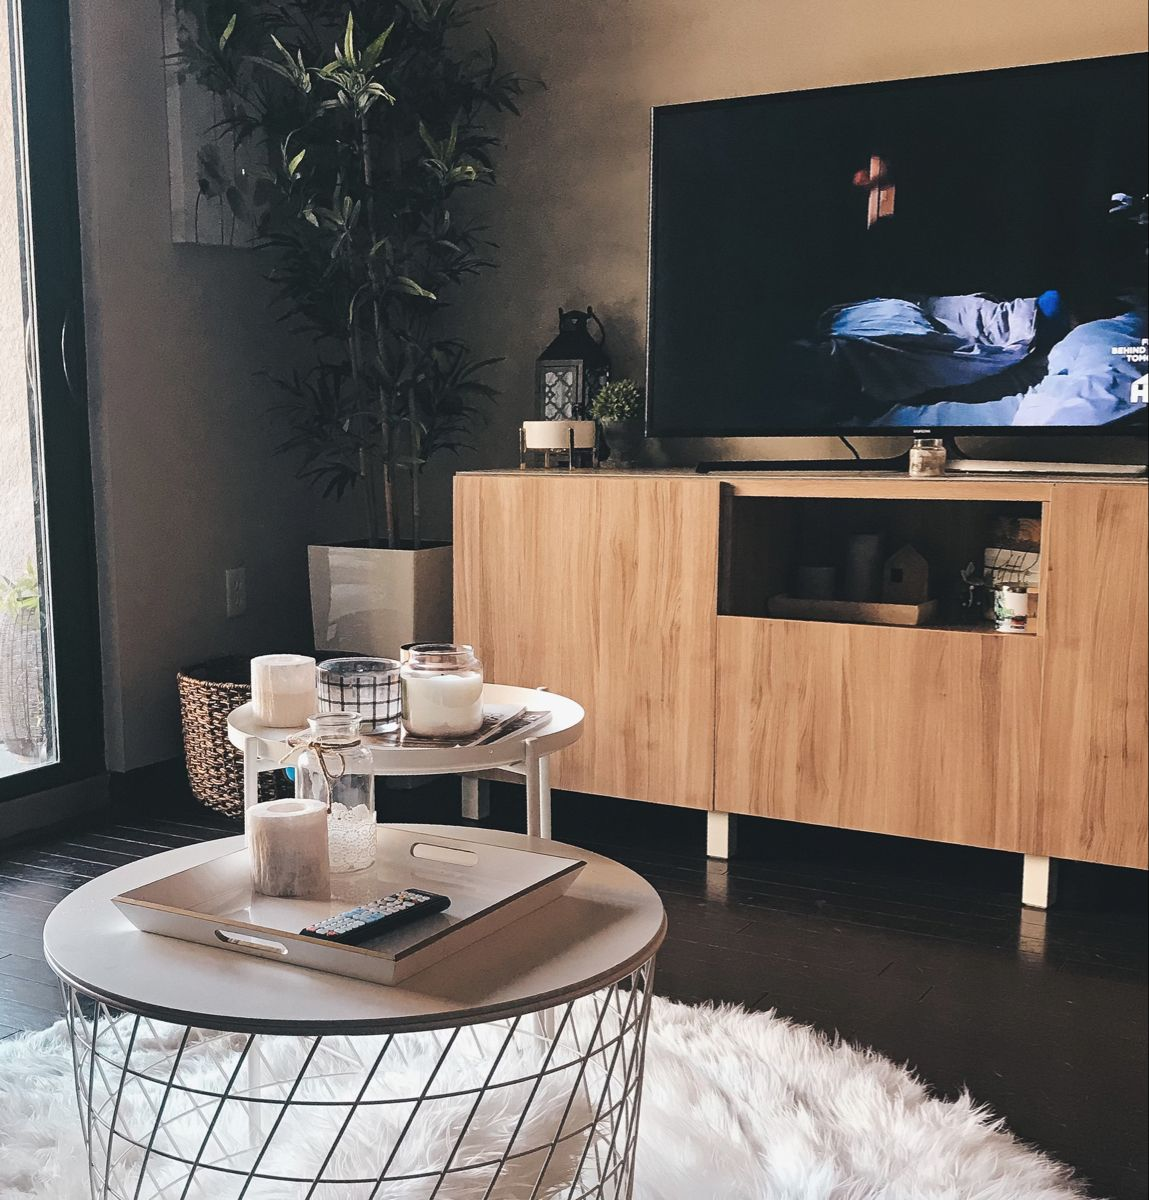 DIY - Customized TV Stand from IKEA #modernfarmhousedecor #diy #ikea #home #homedecorideas #inspiration #inspohome #inspoforhome #aesthetic #house #houseplants #tvstandideas #white #wood